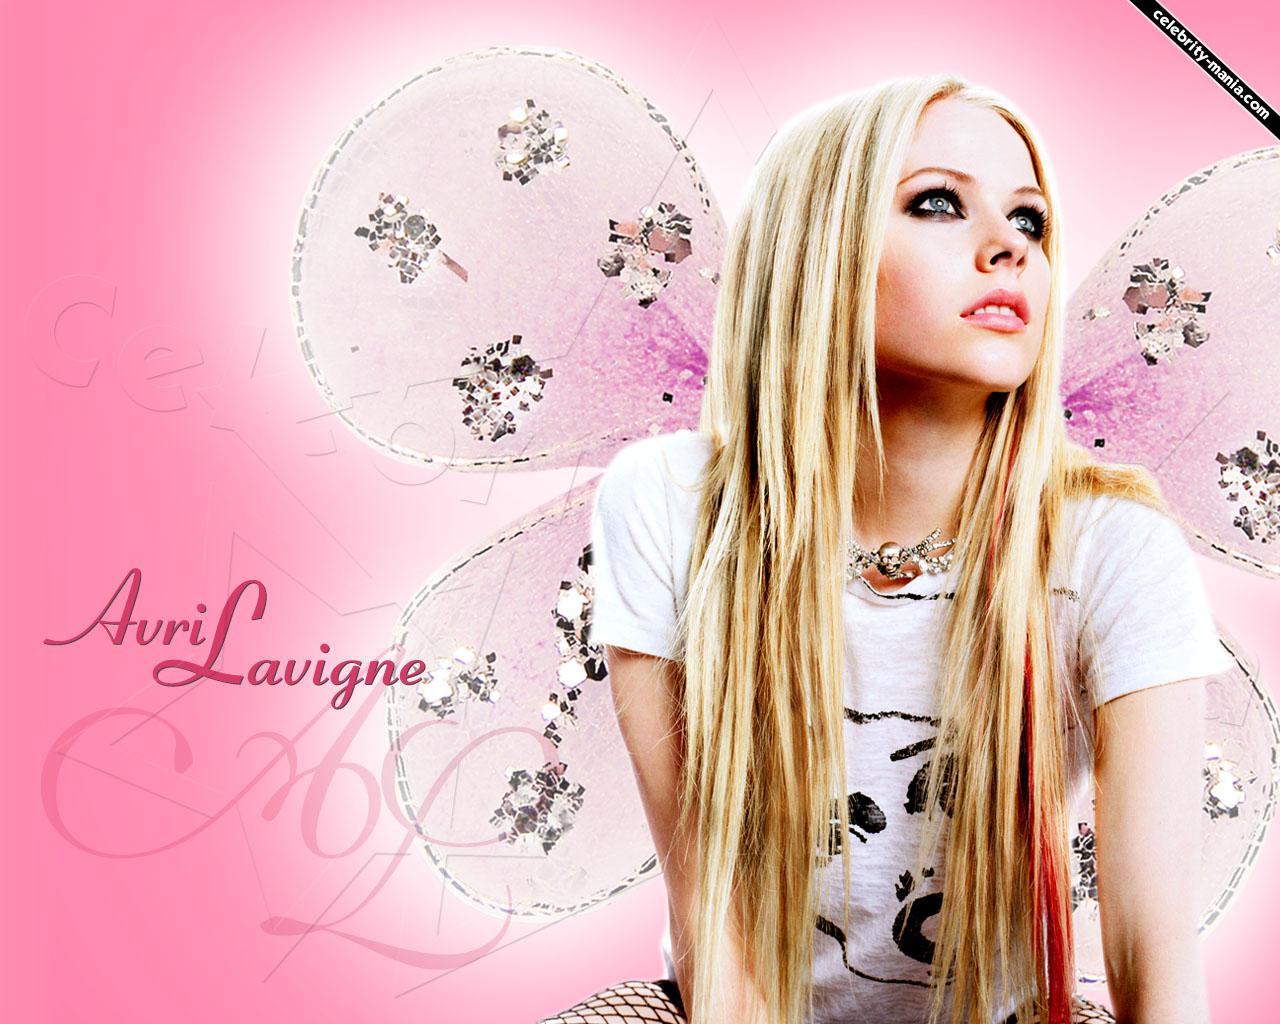 Avril Lavigne 1 Wallpapers: Wallpapers Dekstop 4 U: AVRIL LAVIGNE WALLPAPER